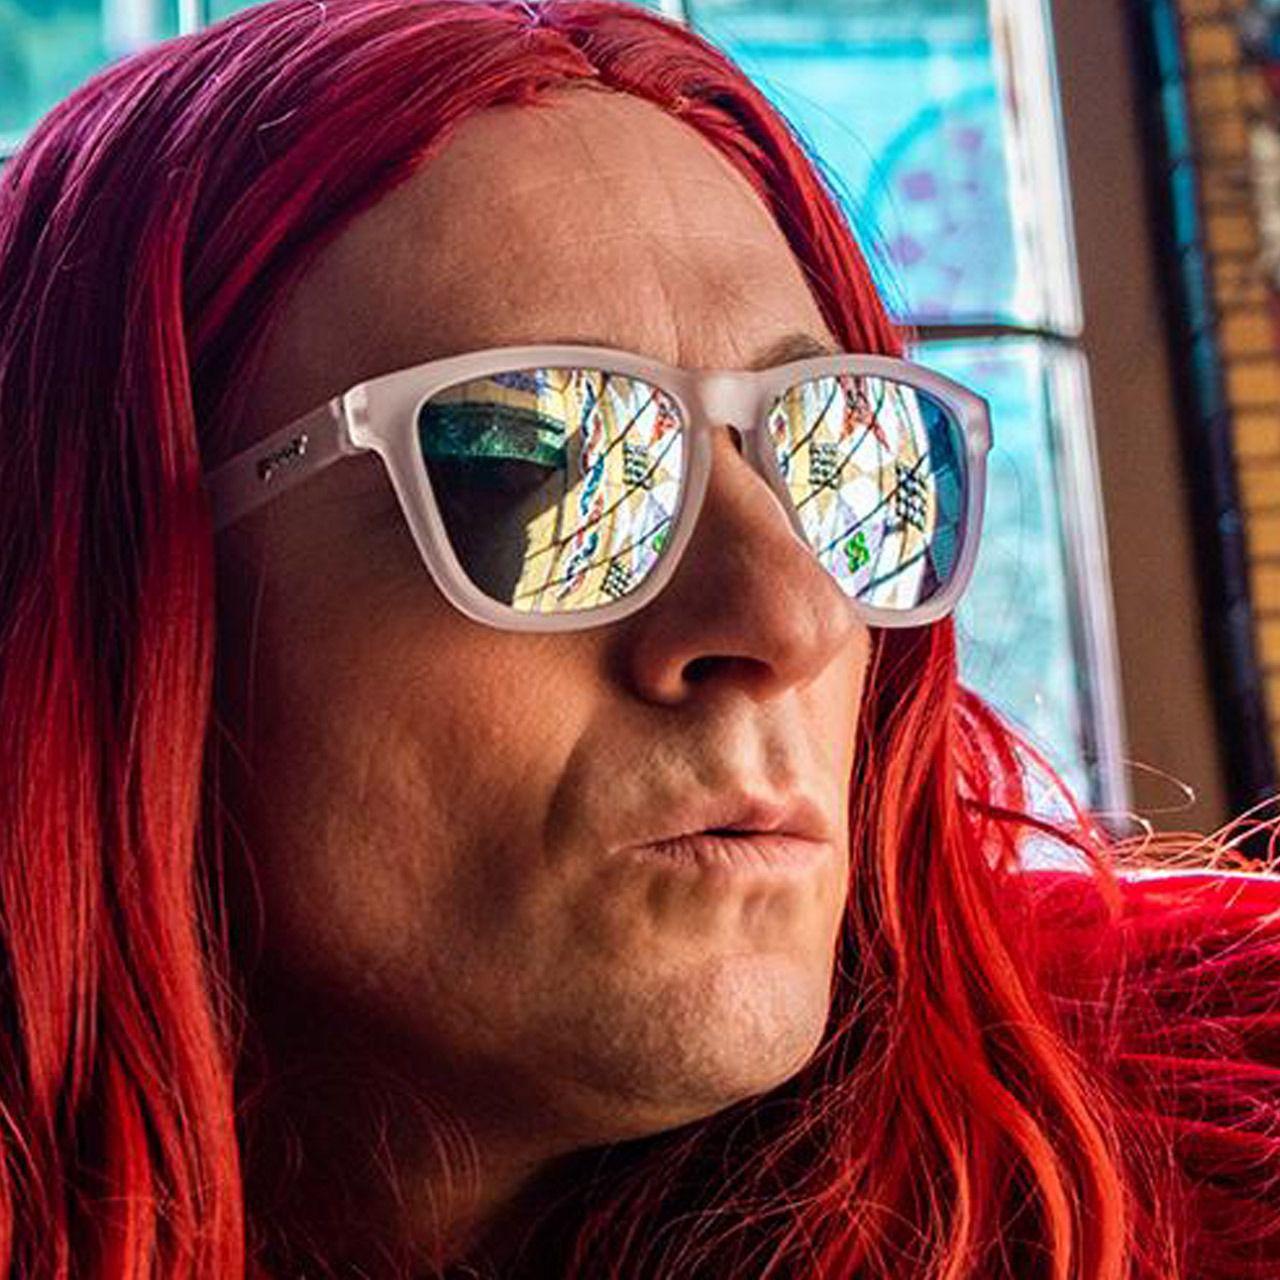 Oculos de Sol Goodr -  Melisandre's Day Care